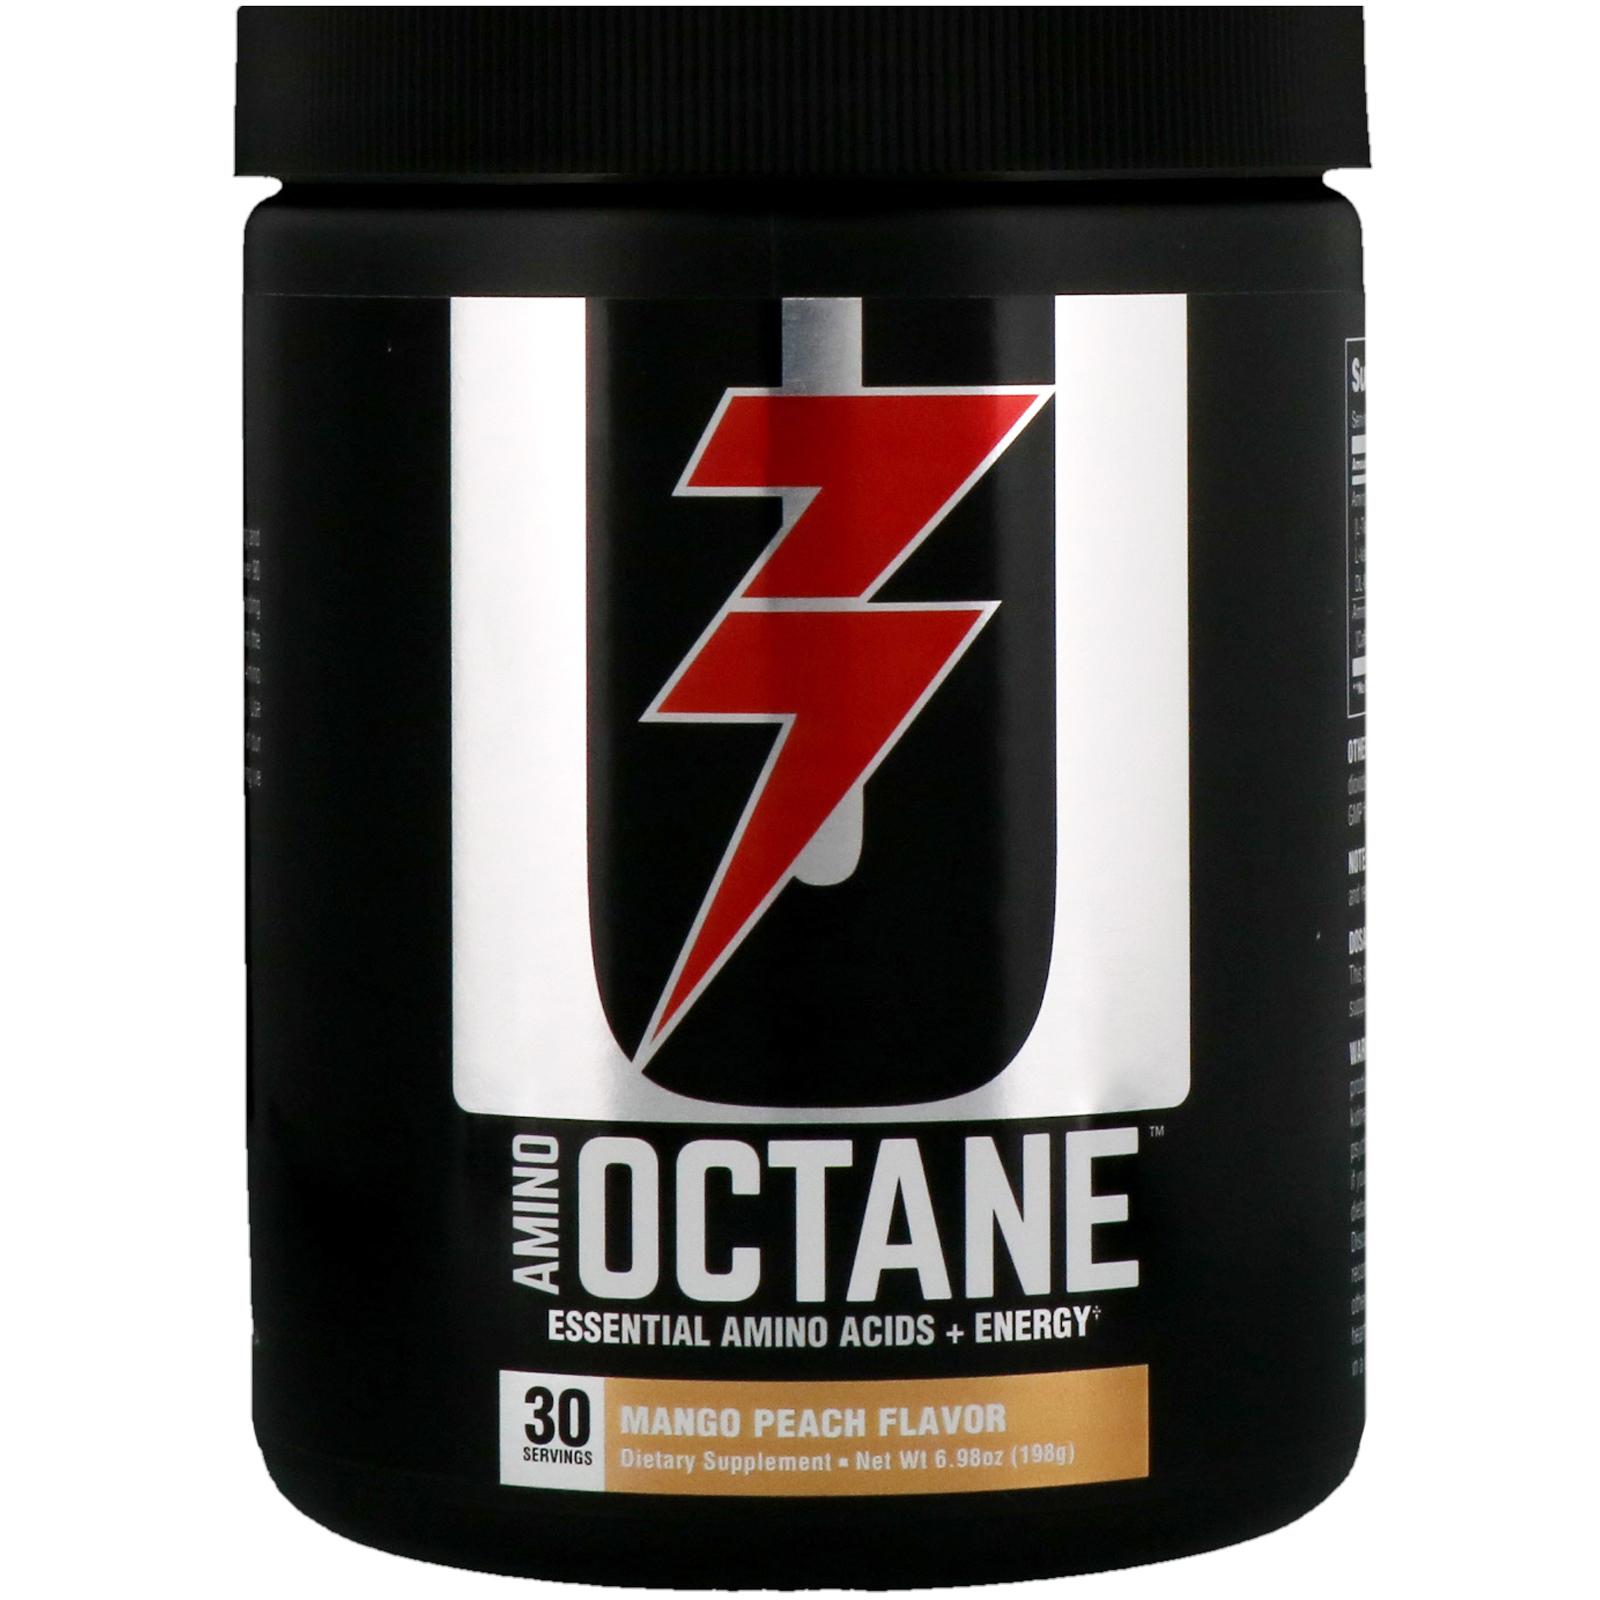 Universal Nutrition Amino Octane Essential Acids Energy Ultimate Bcaa 500mg 120 Caps Mango Peach 698